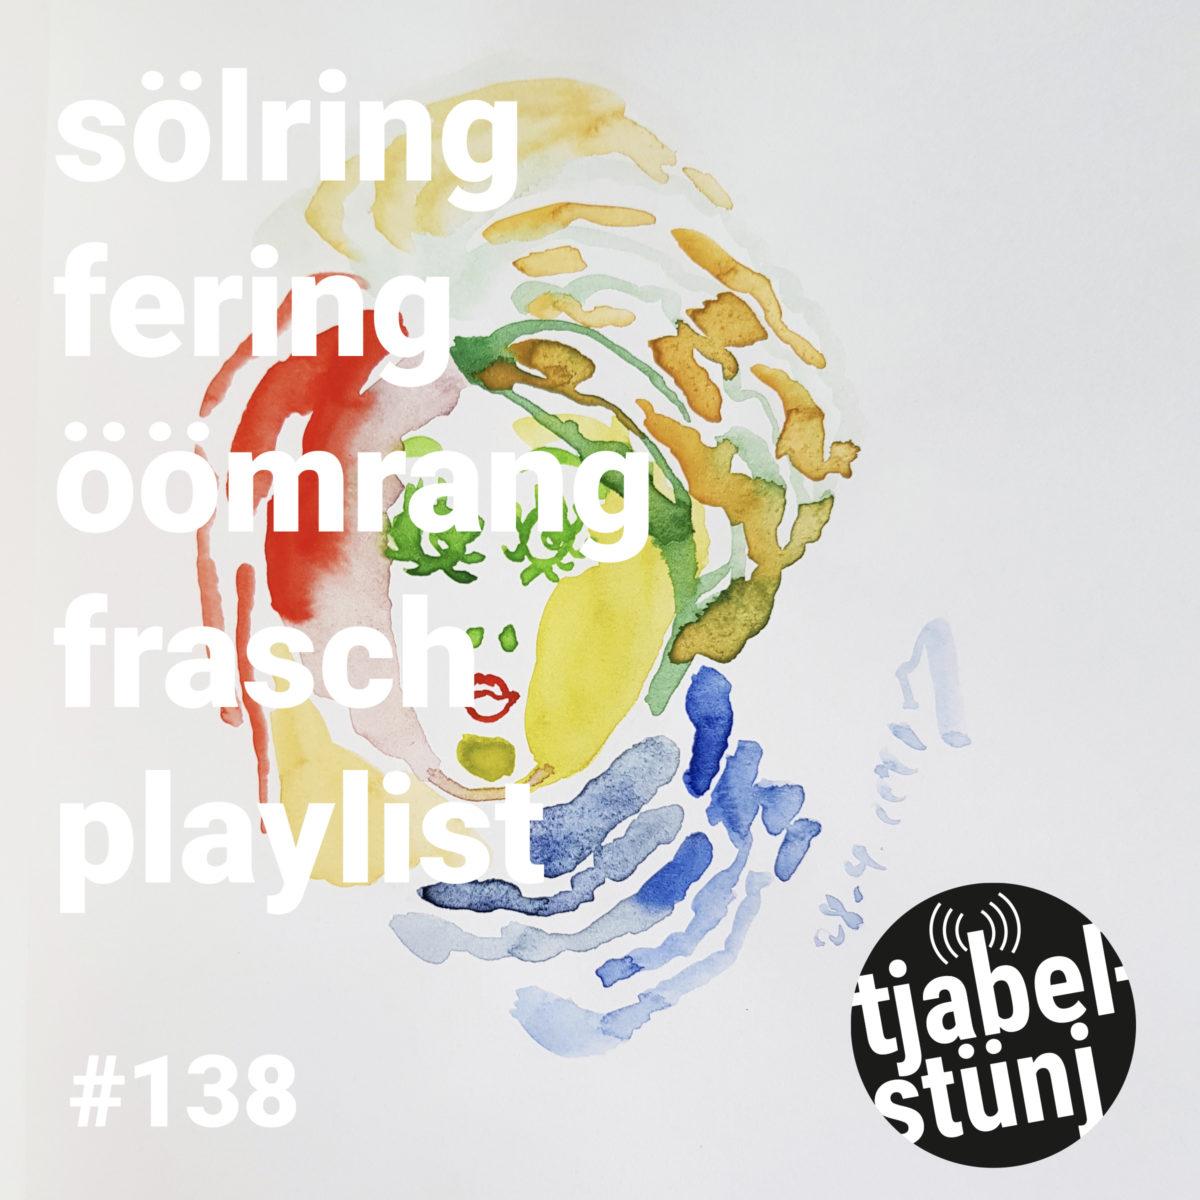 Playlist #138